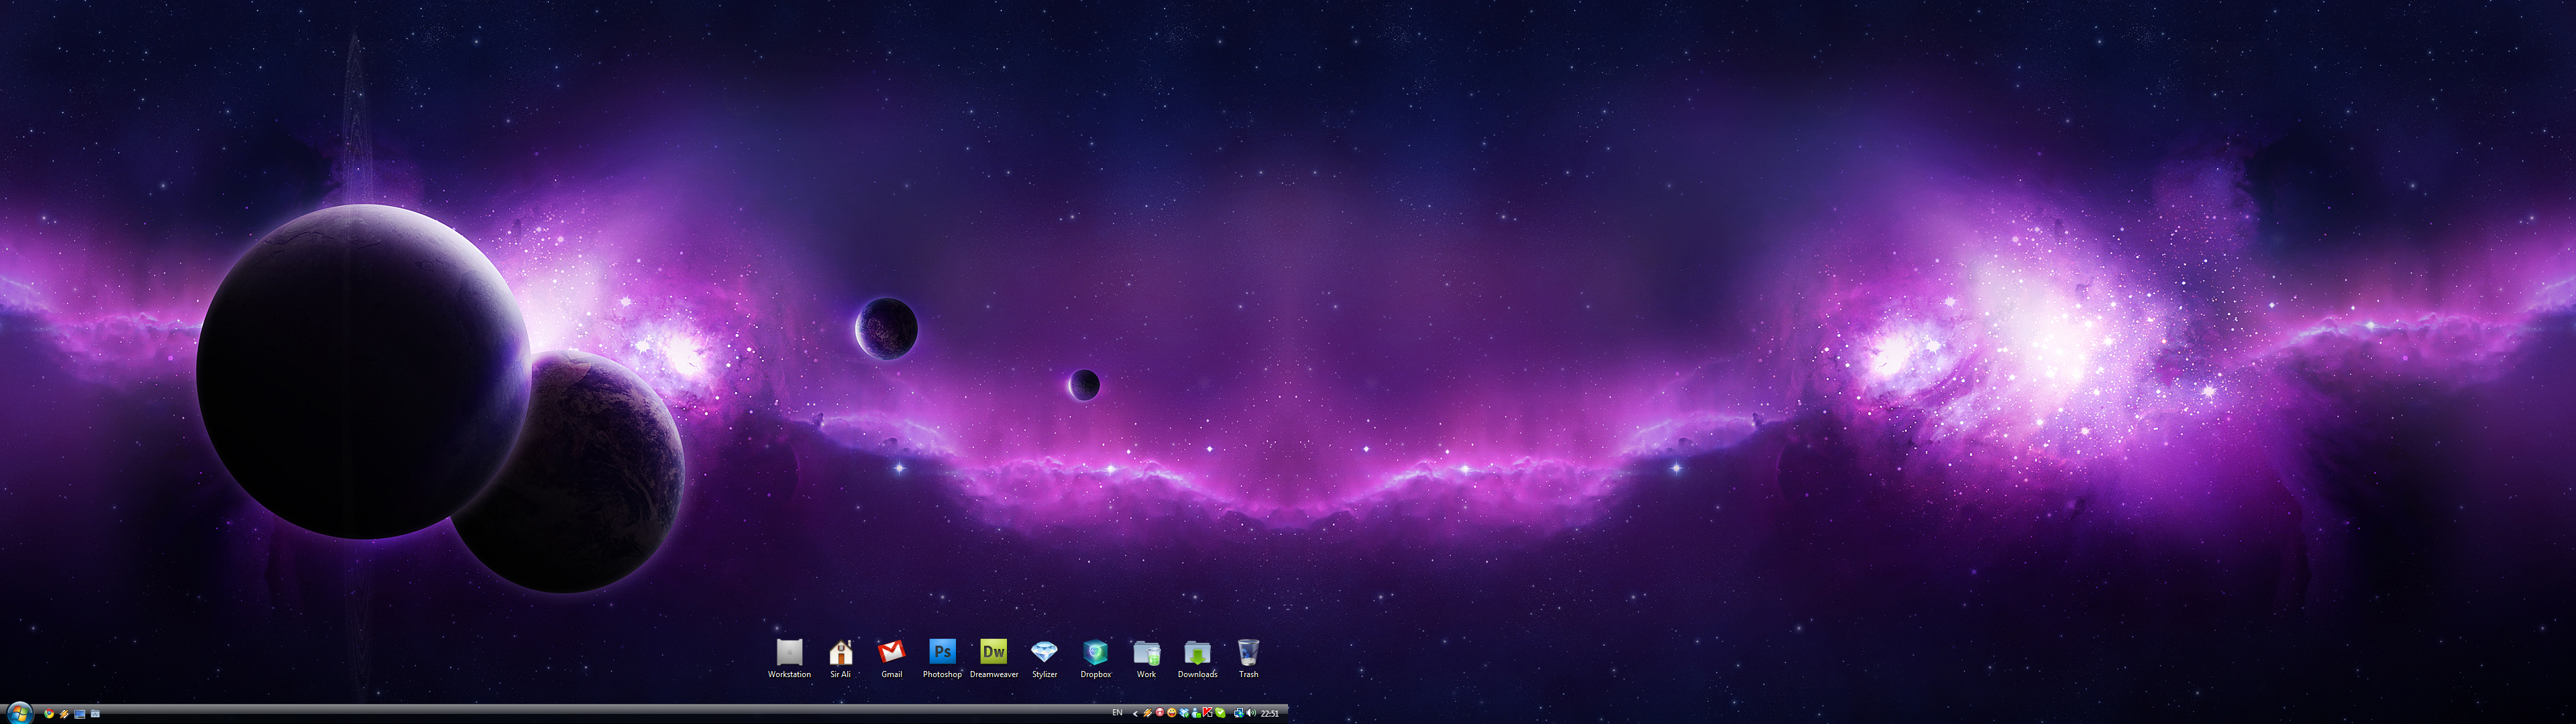 comurl http windows7themes net windows 7 dual monitor theme htmlhtml 3840x1080